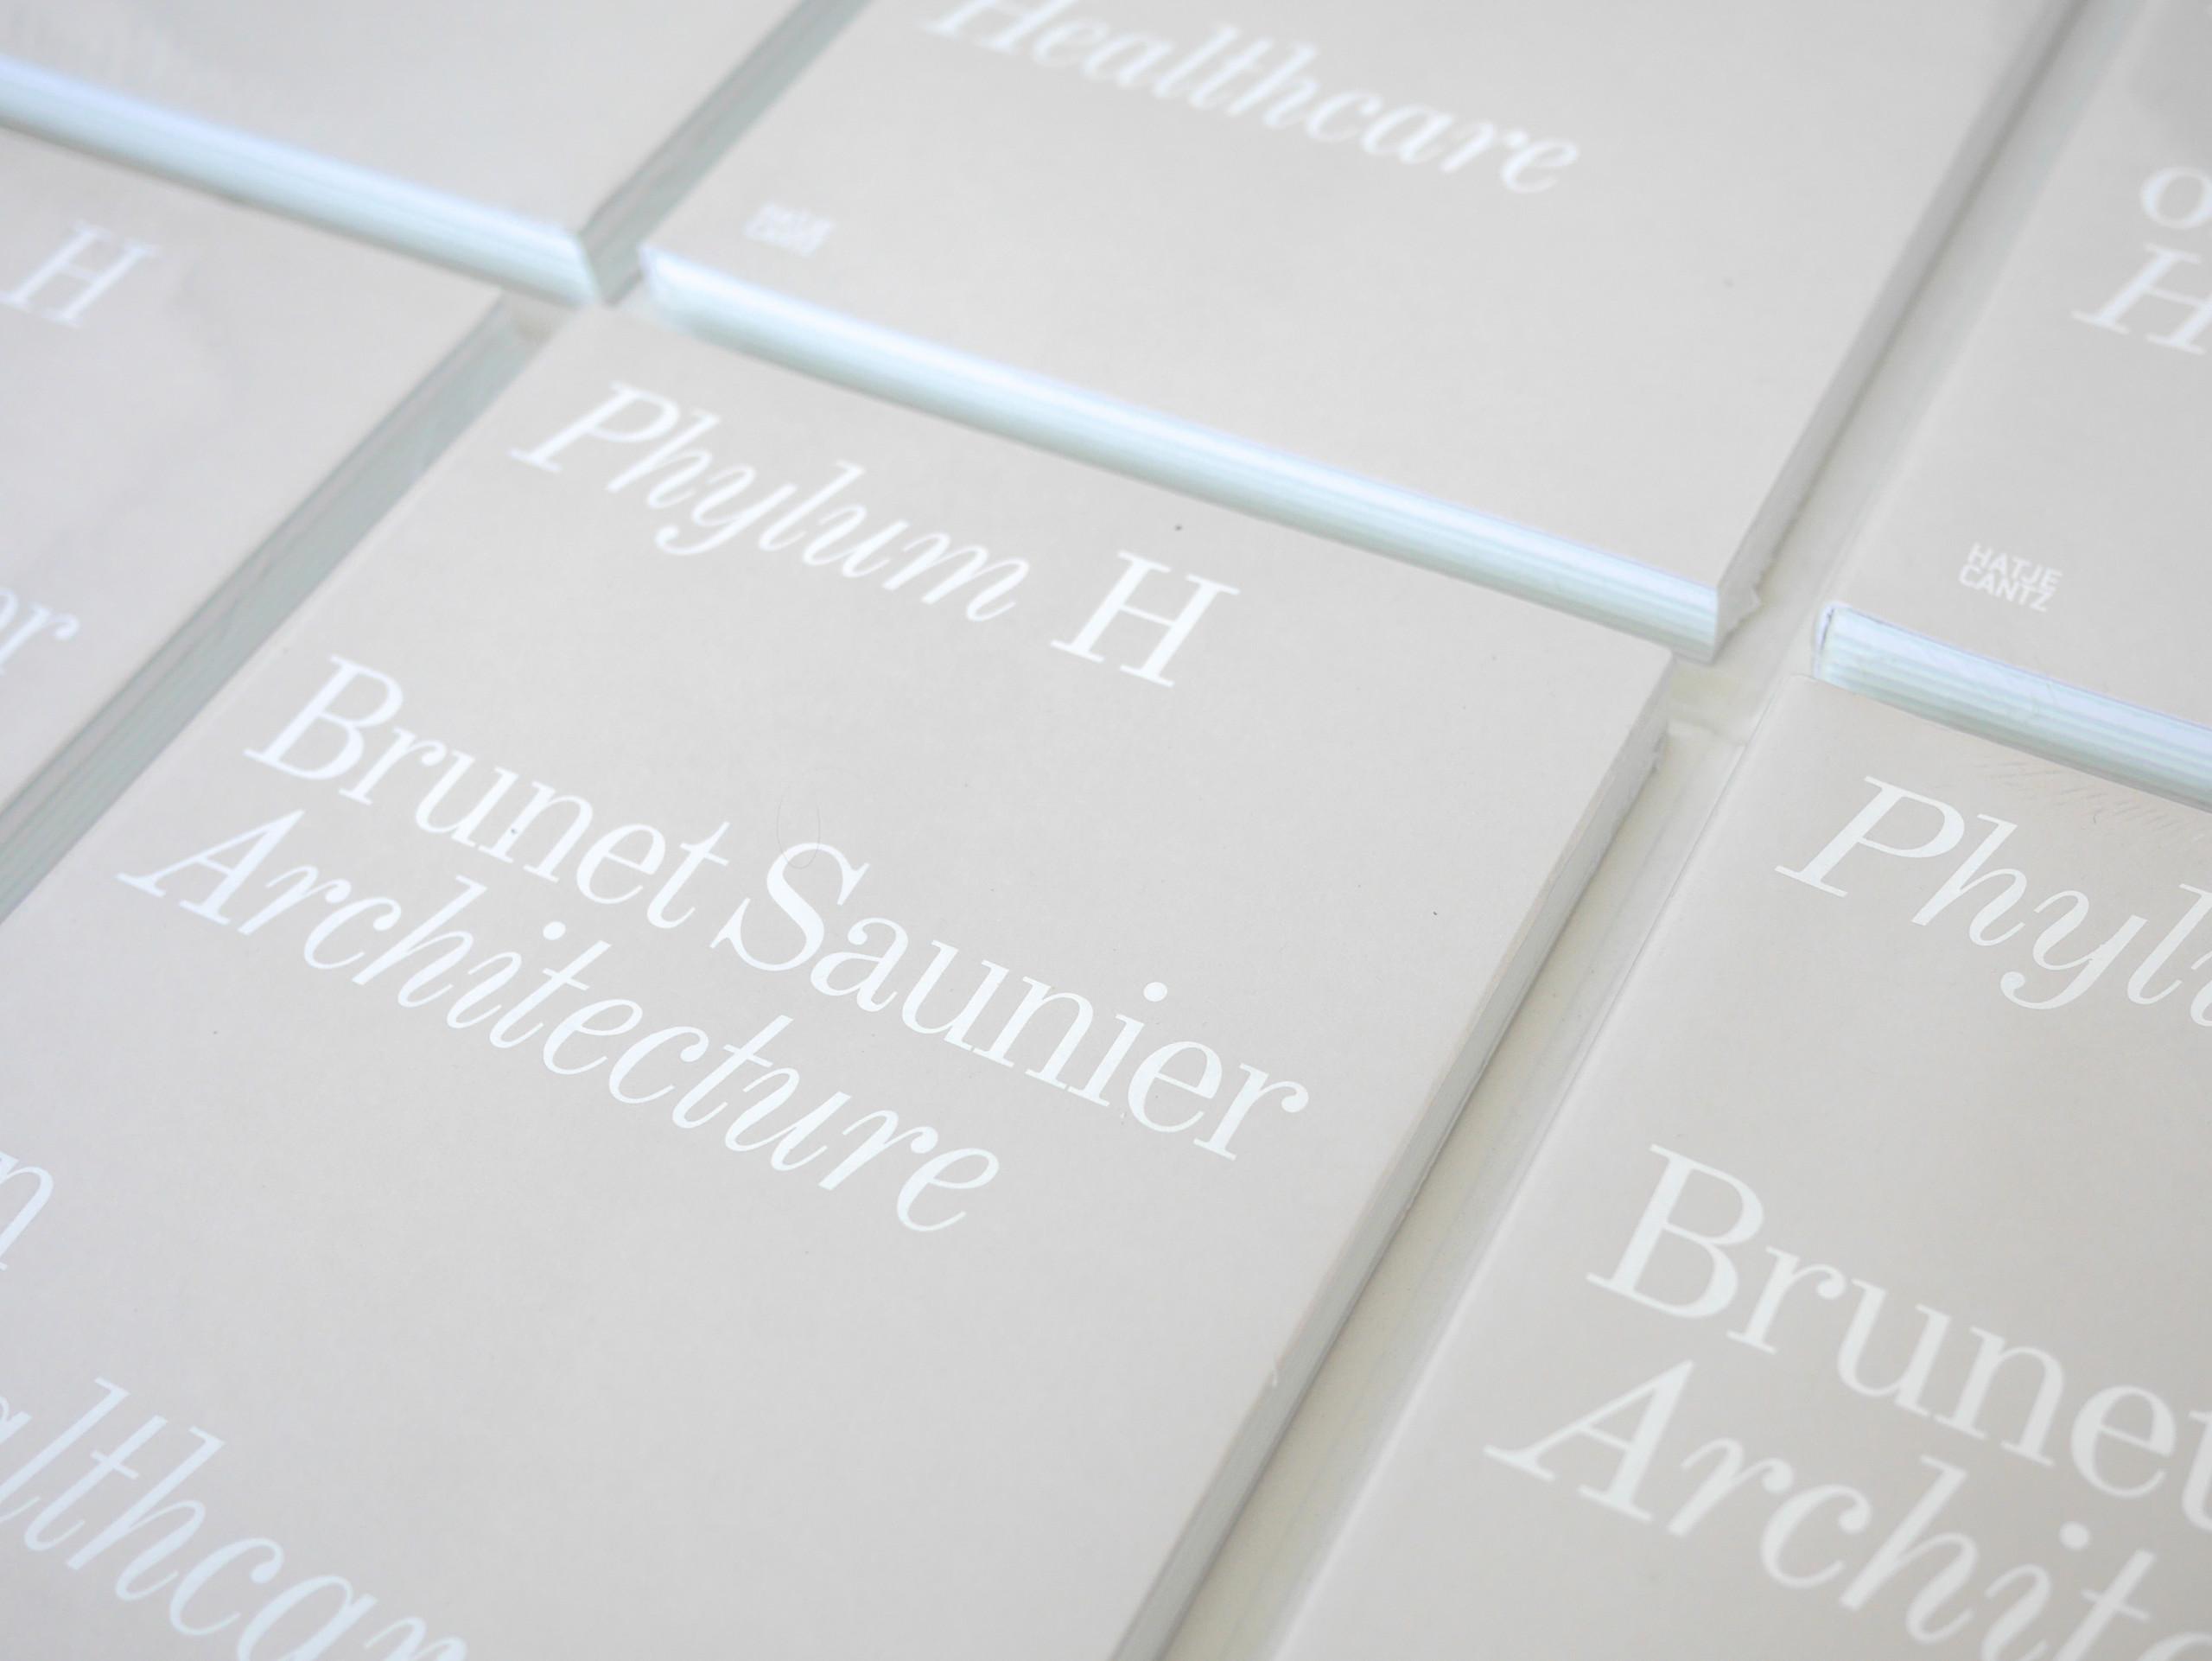 Phylum H, Brunet Saunier Architecture on Healthcare, Ed. Hatje Cantz, Berlin, 2020.